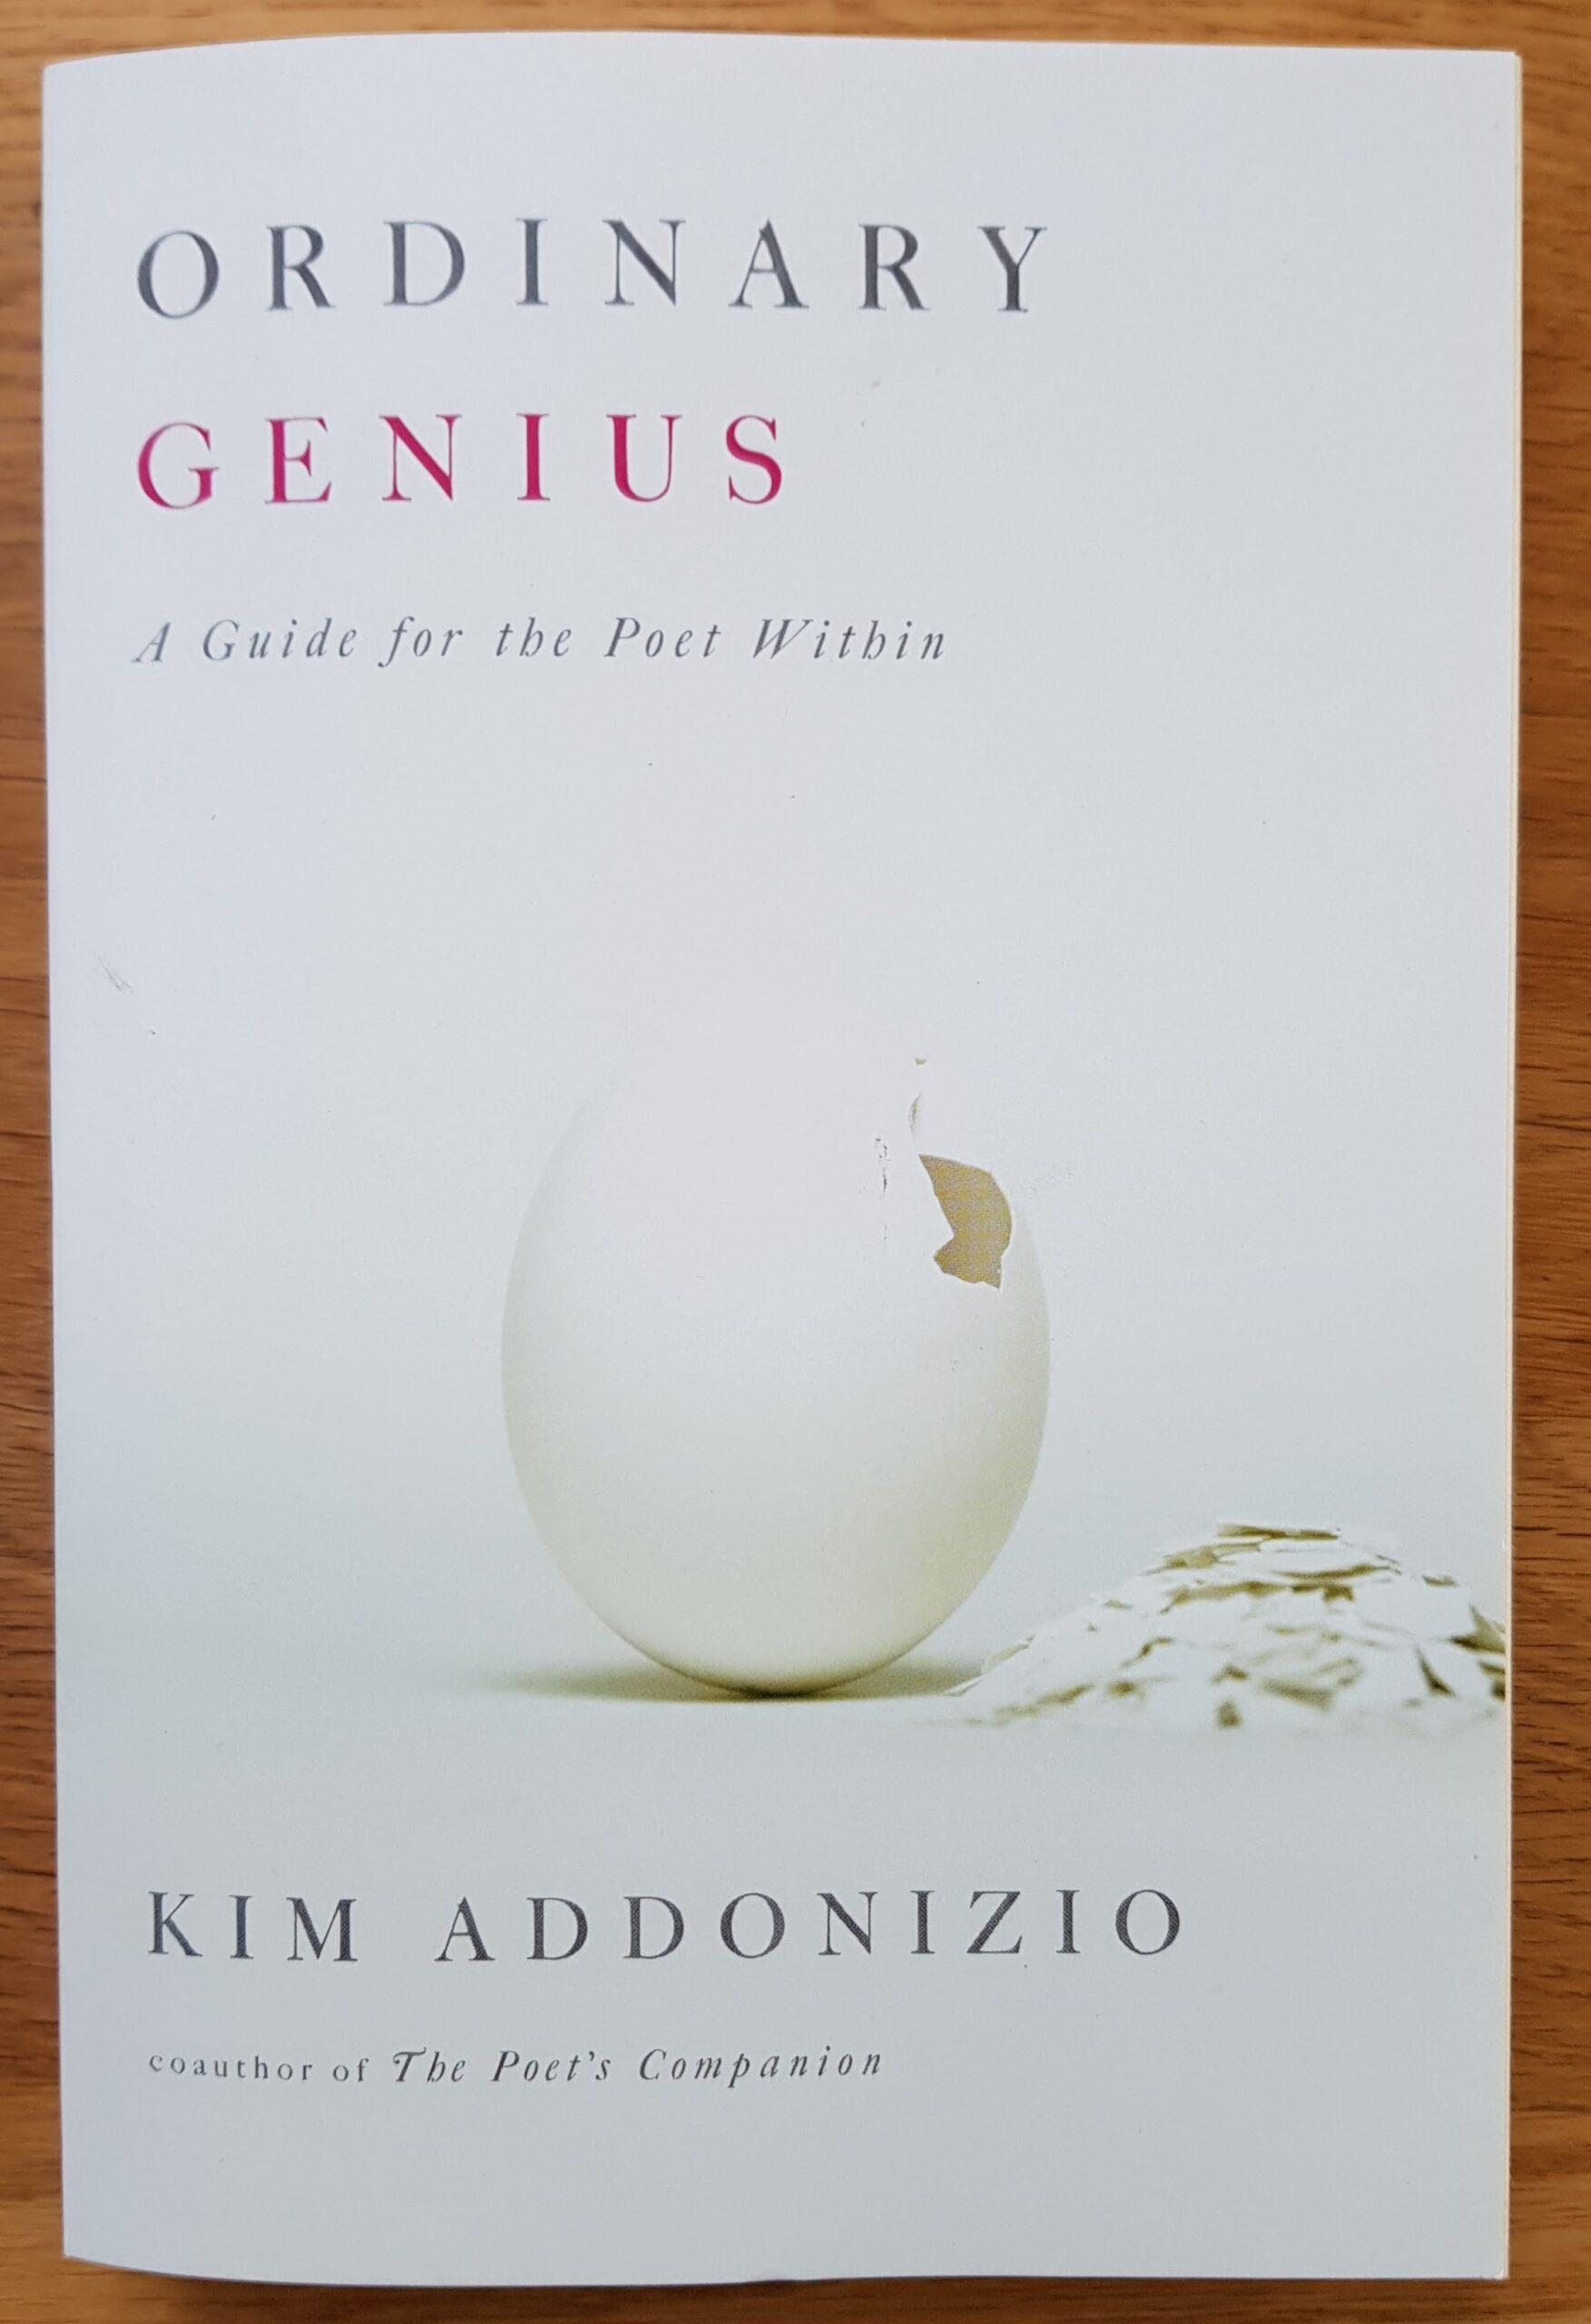 Ordinary Genius by Kim Addonizio